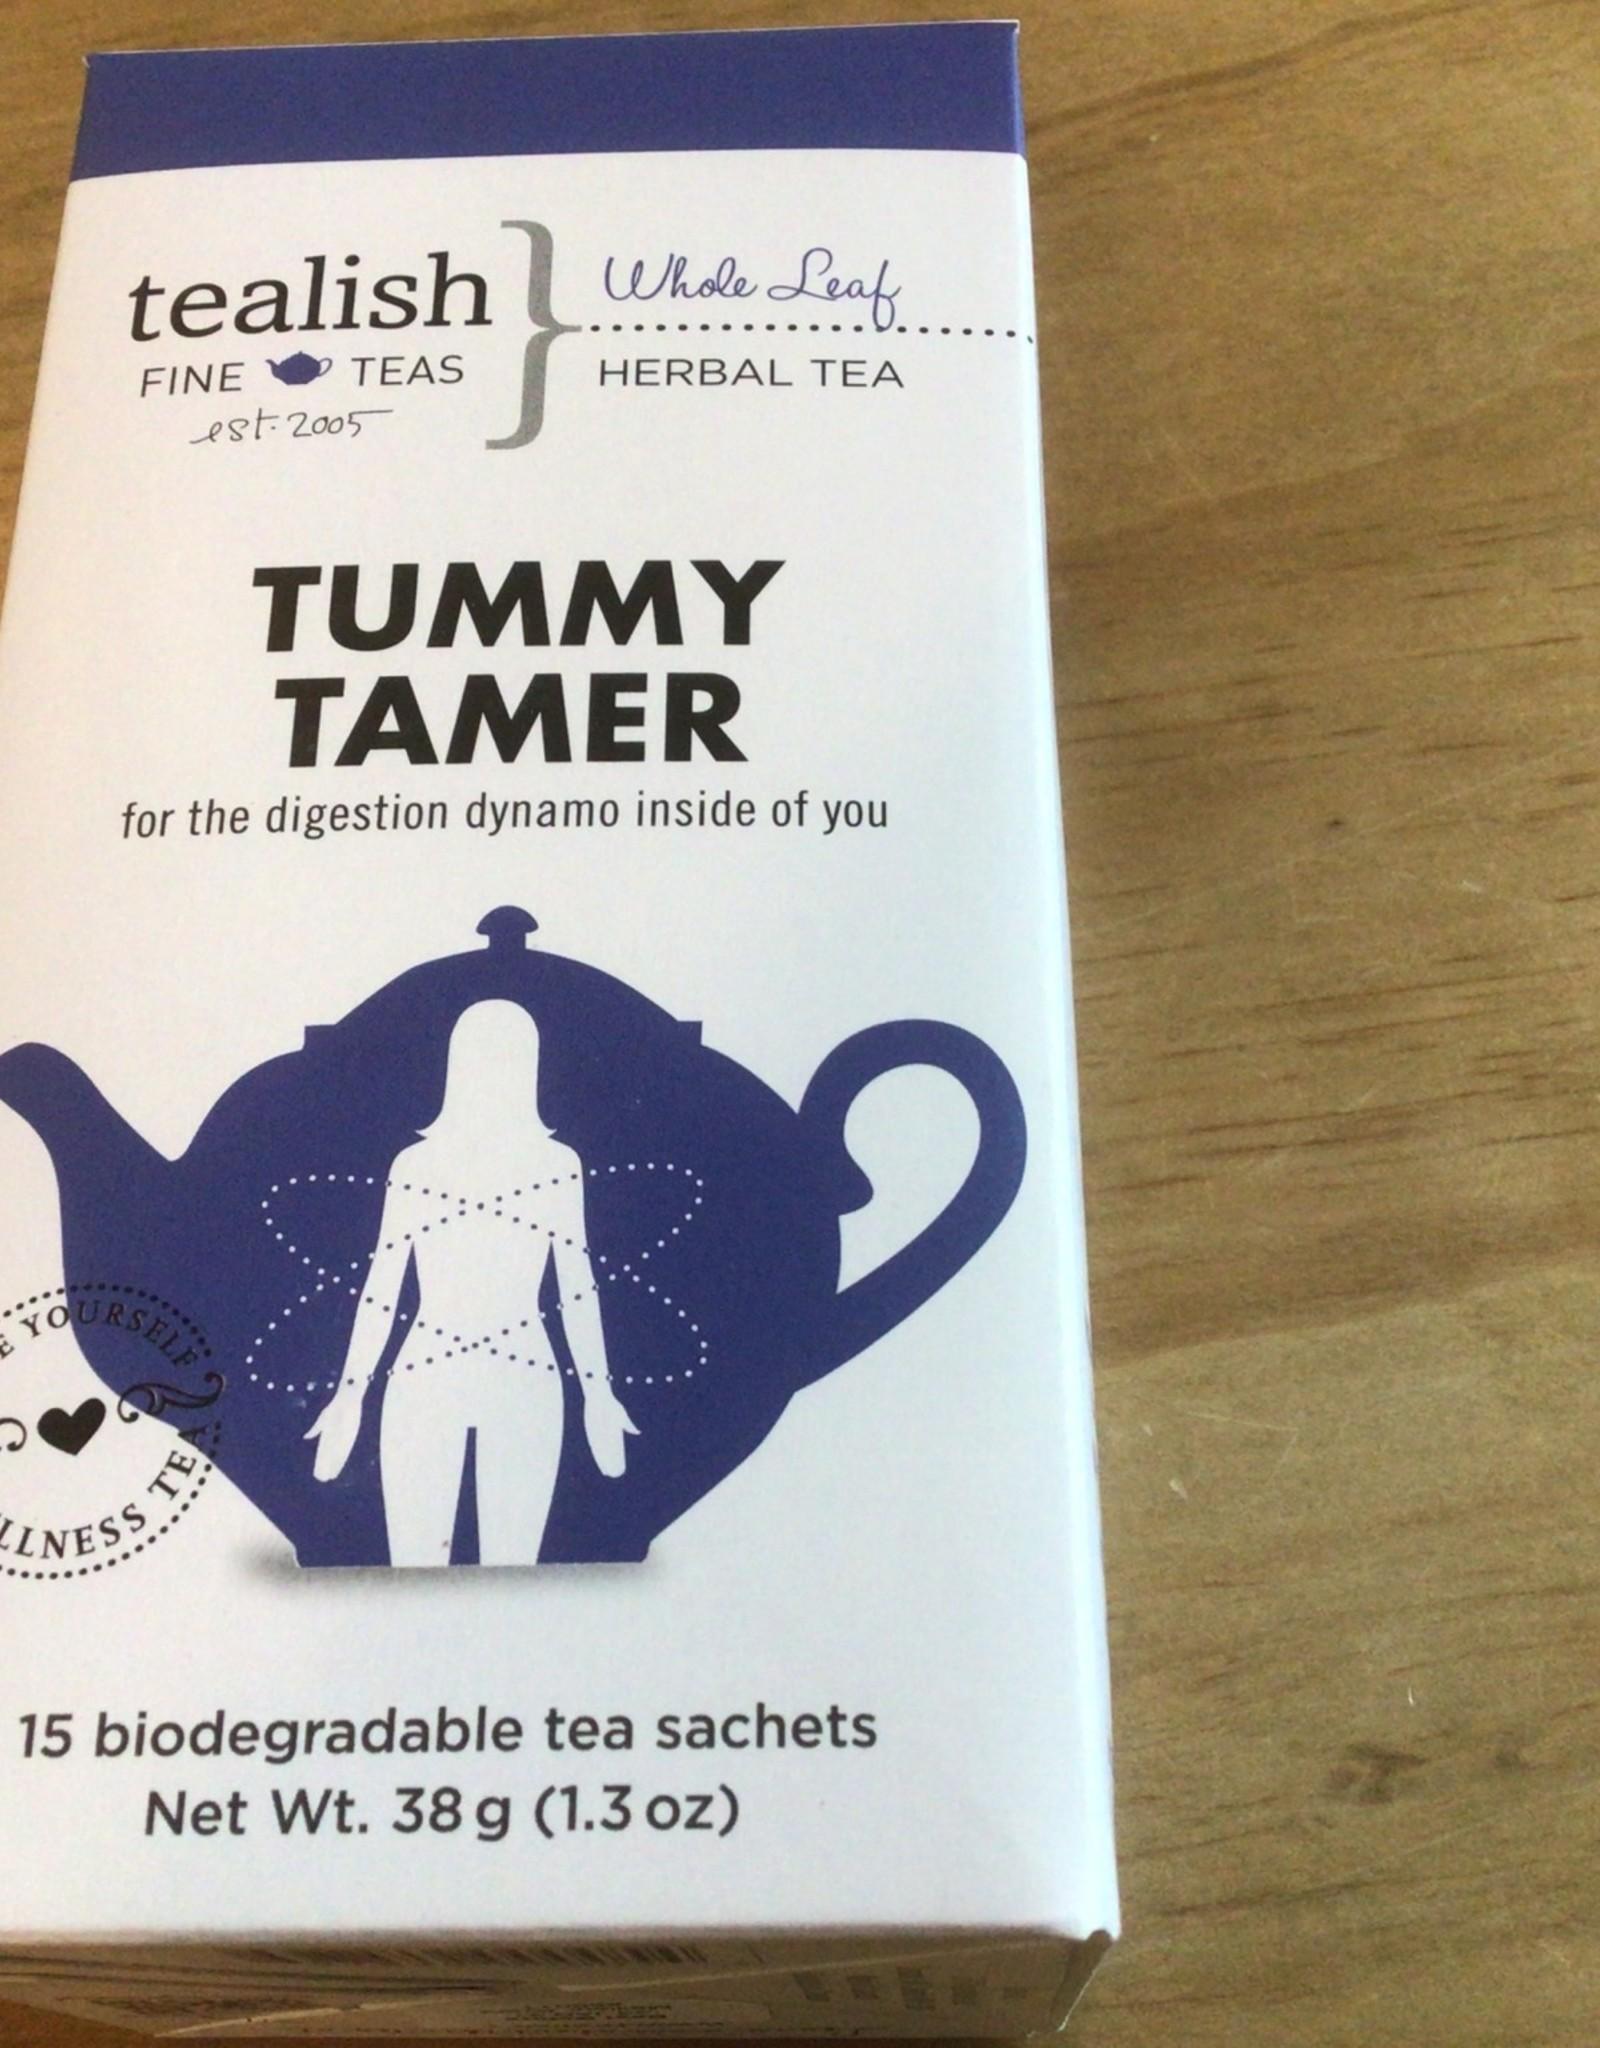 Tealish Tummy Tamer Tea 15 bags